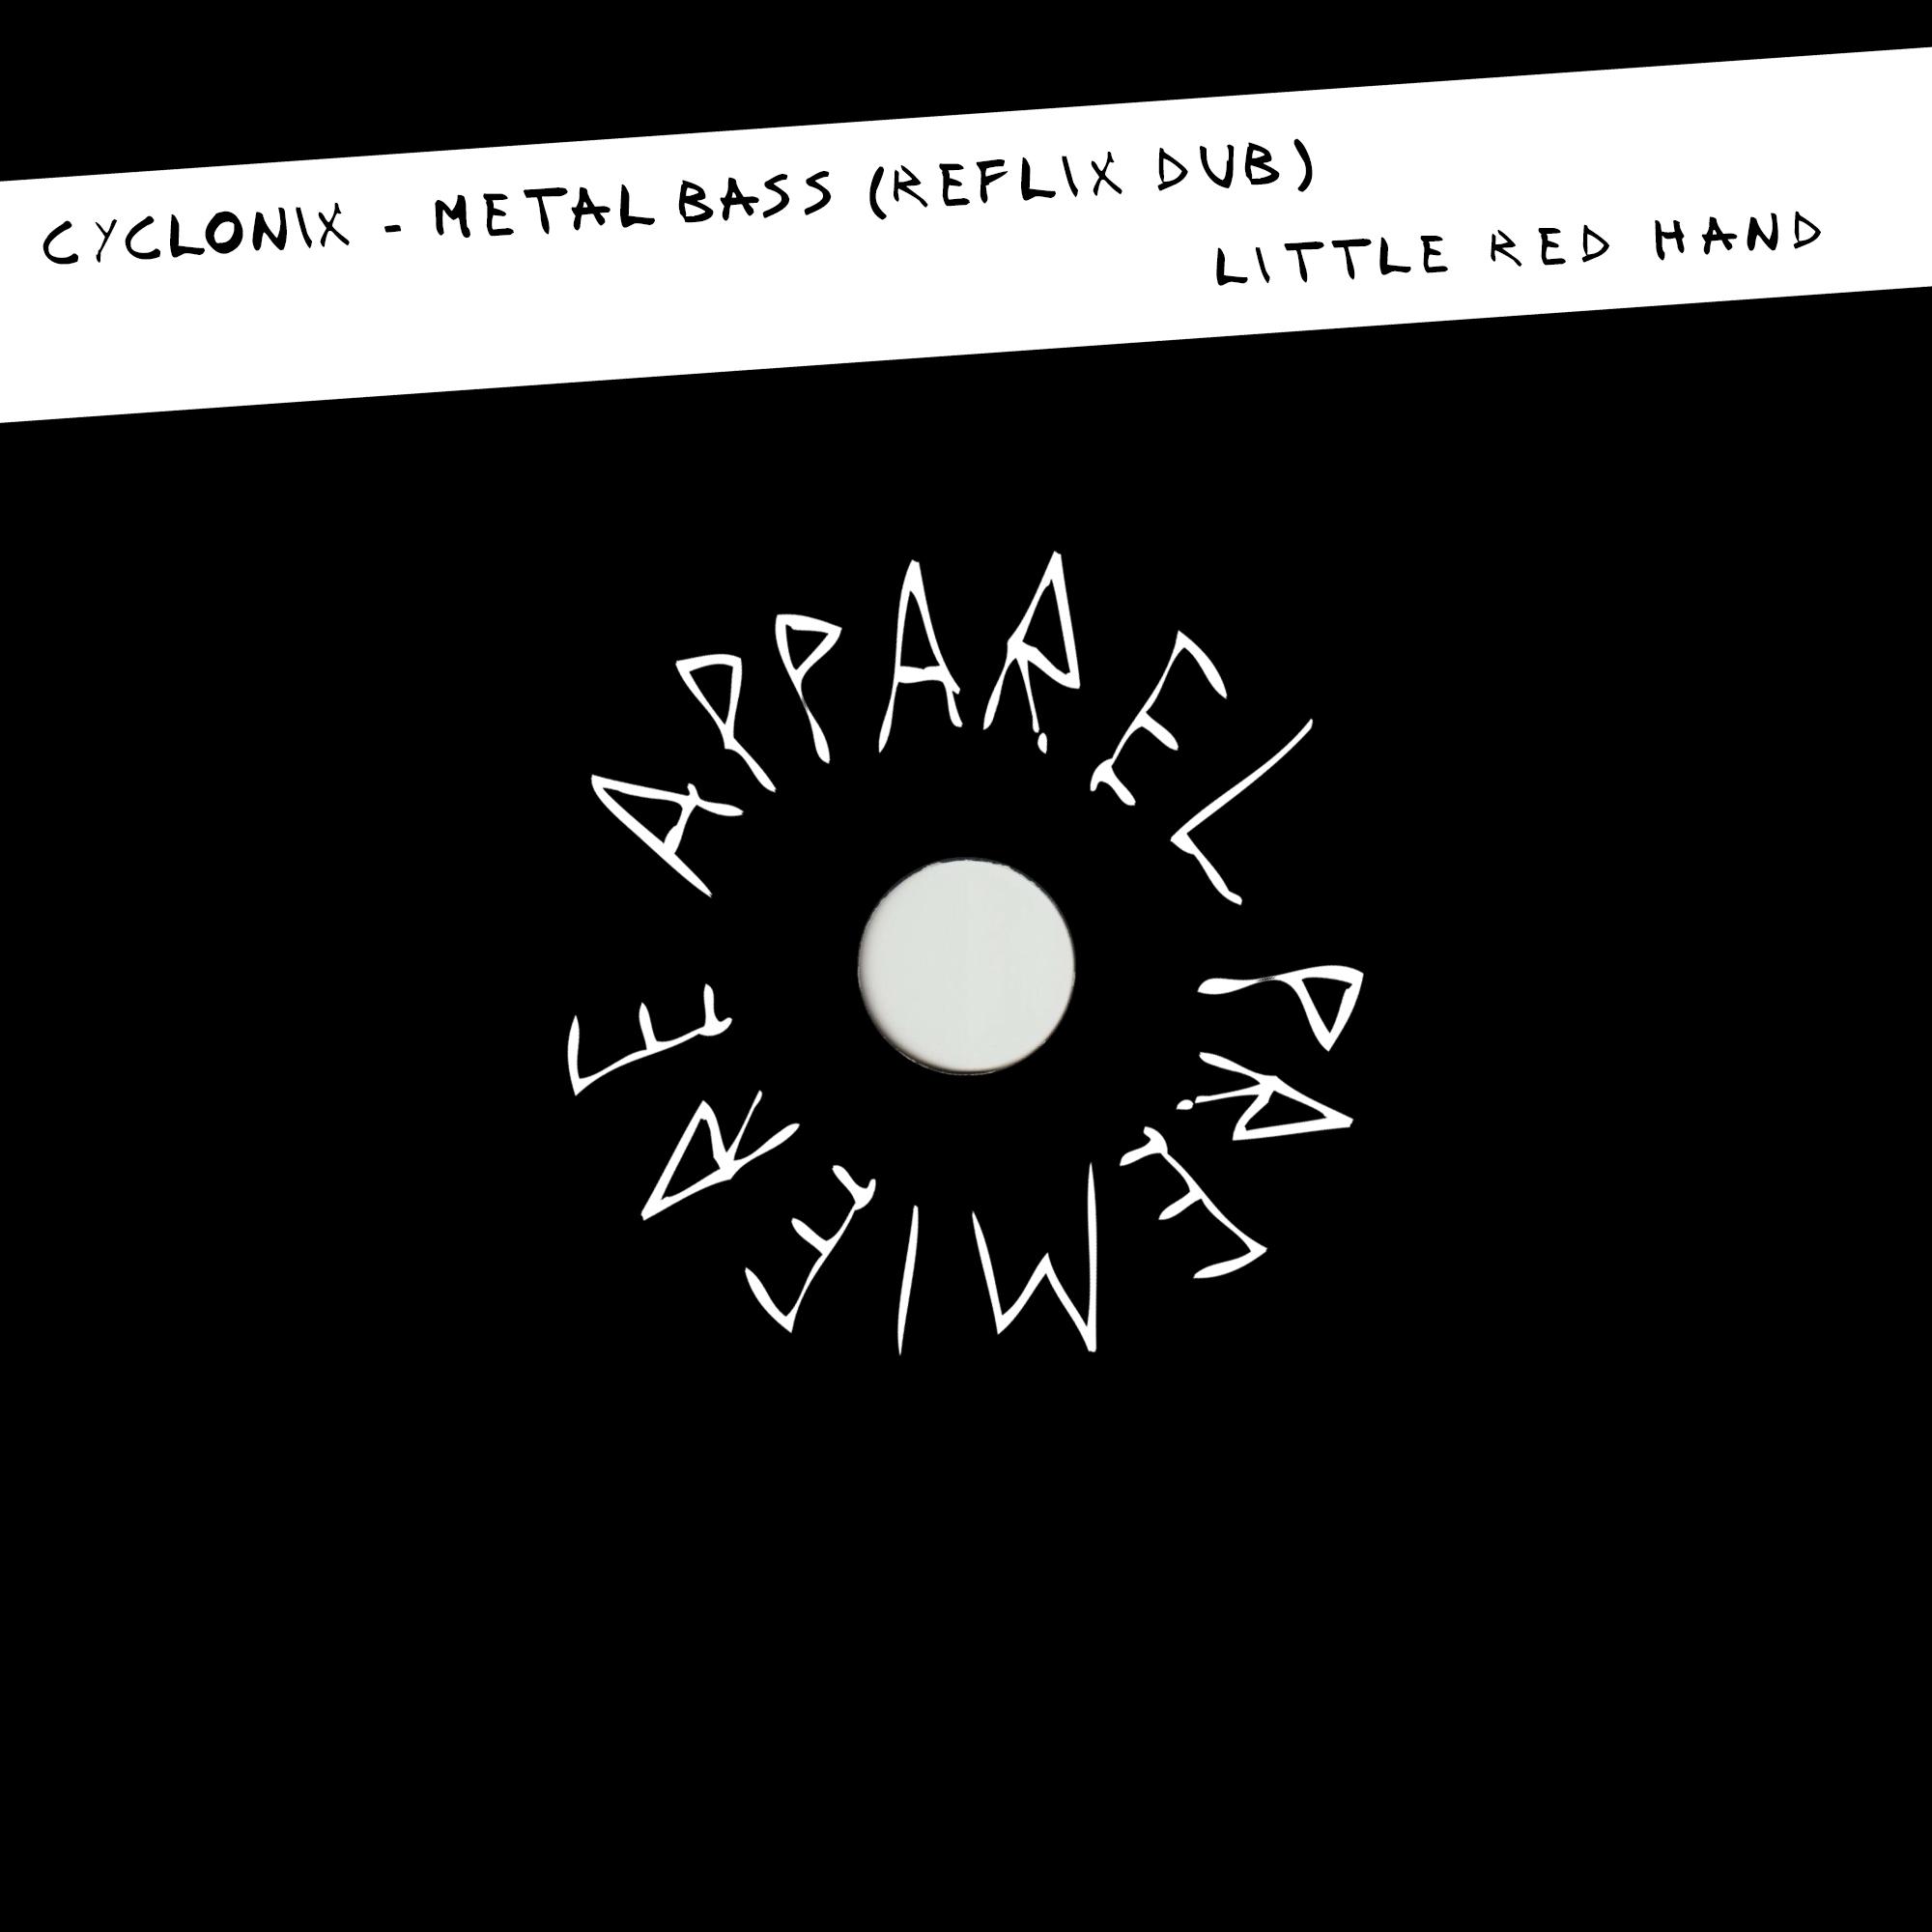 APPAREL PREMIERE: Cyclonix – Metal Bass (Reflix Dub) [Little Red Hand]